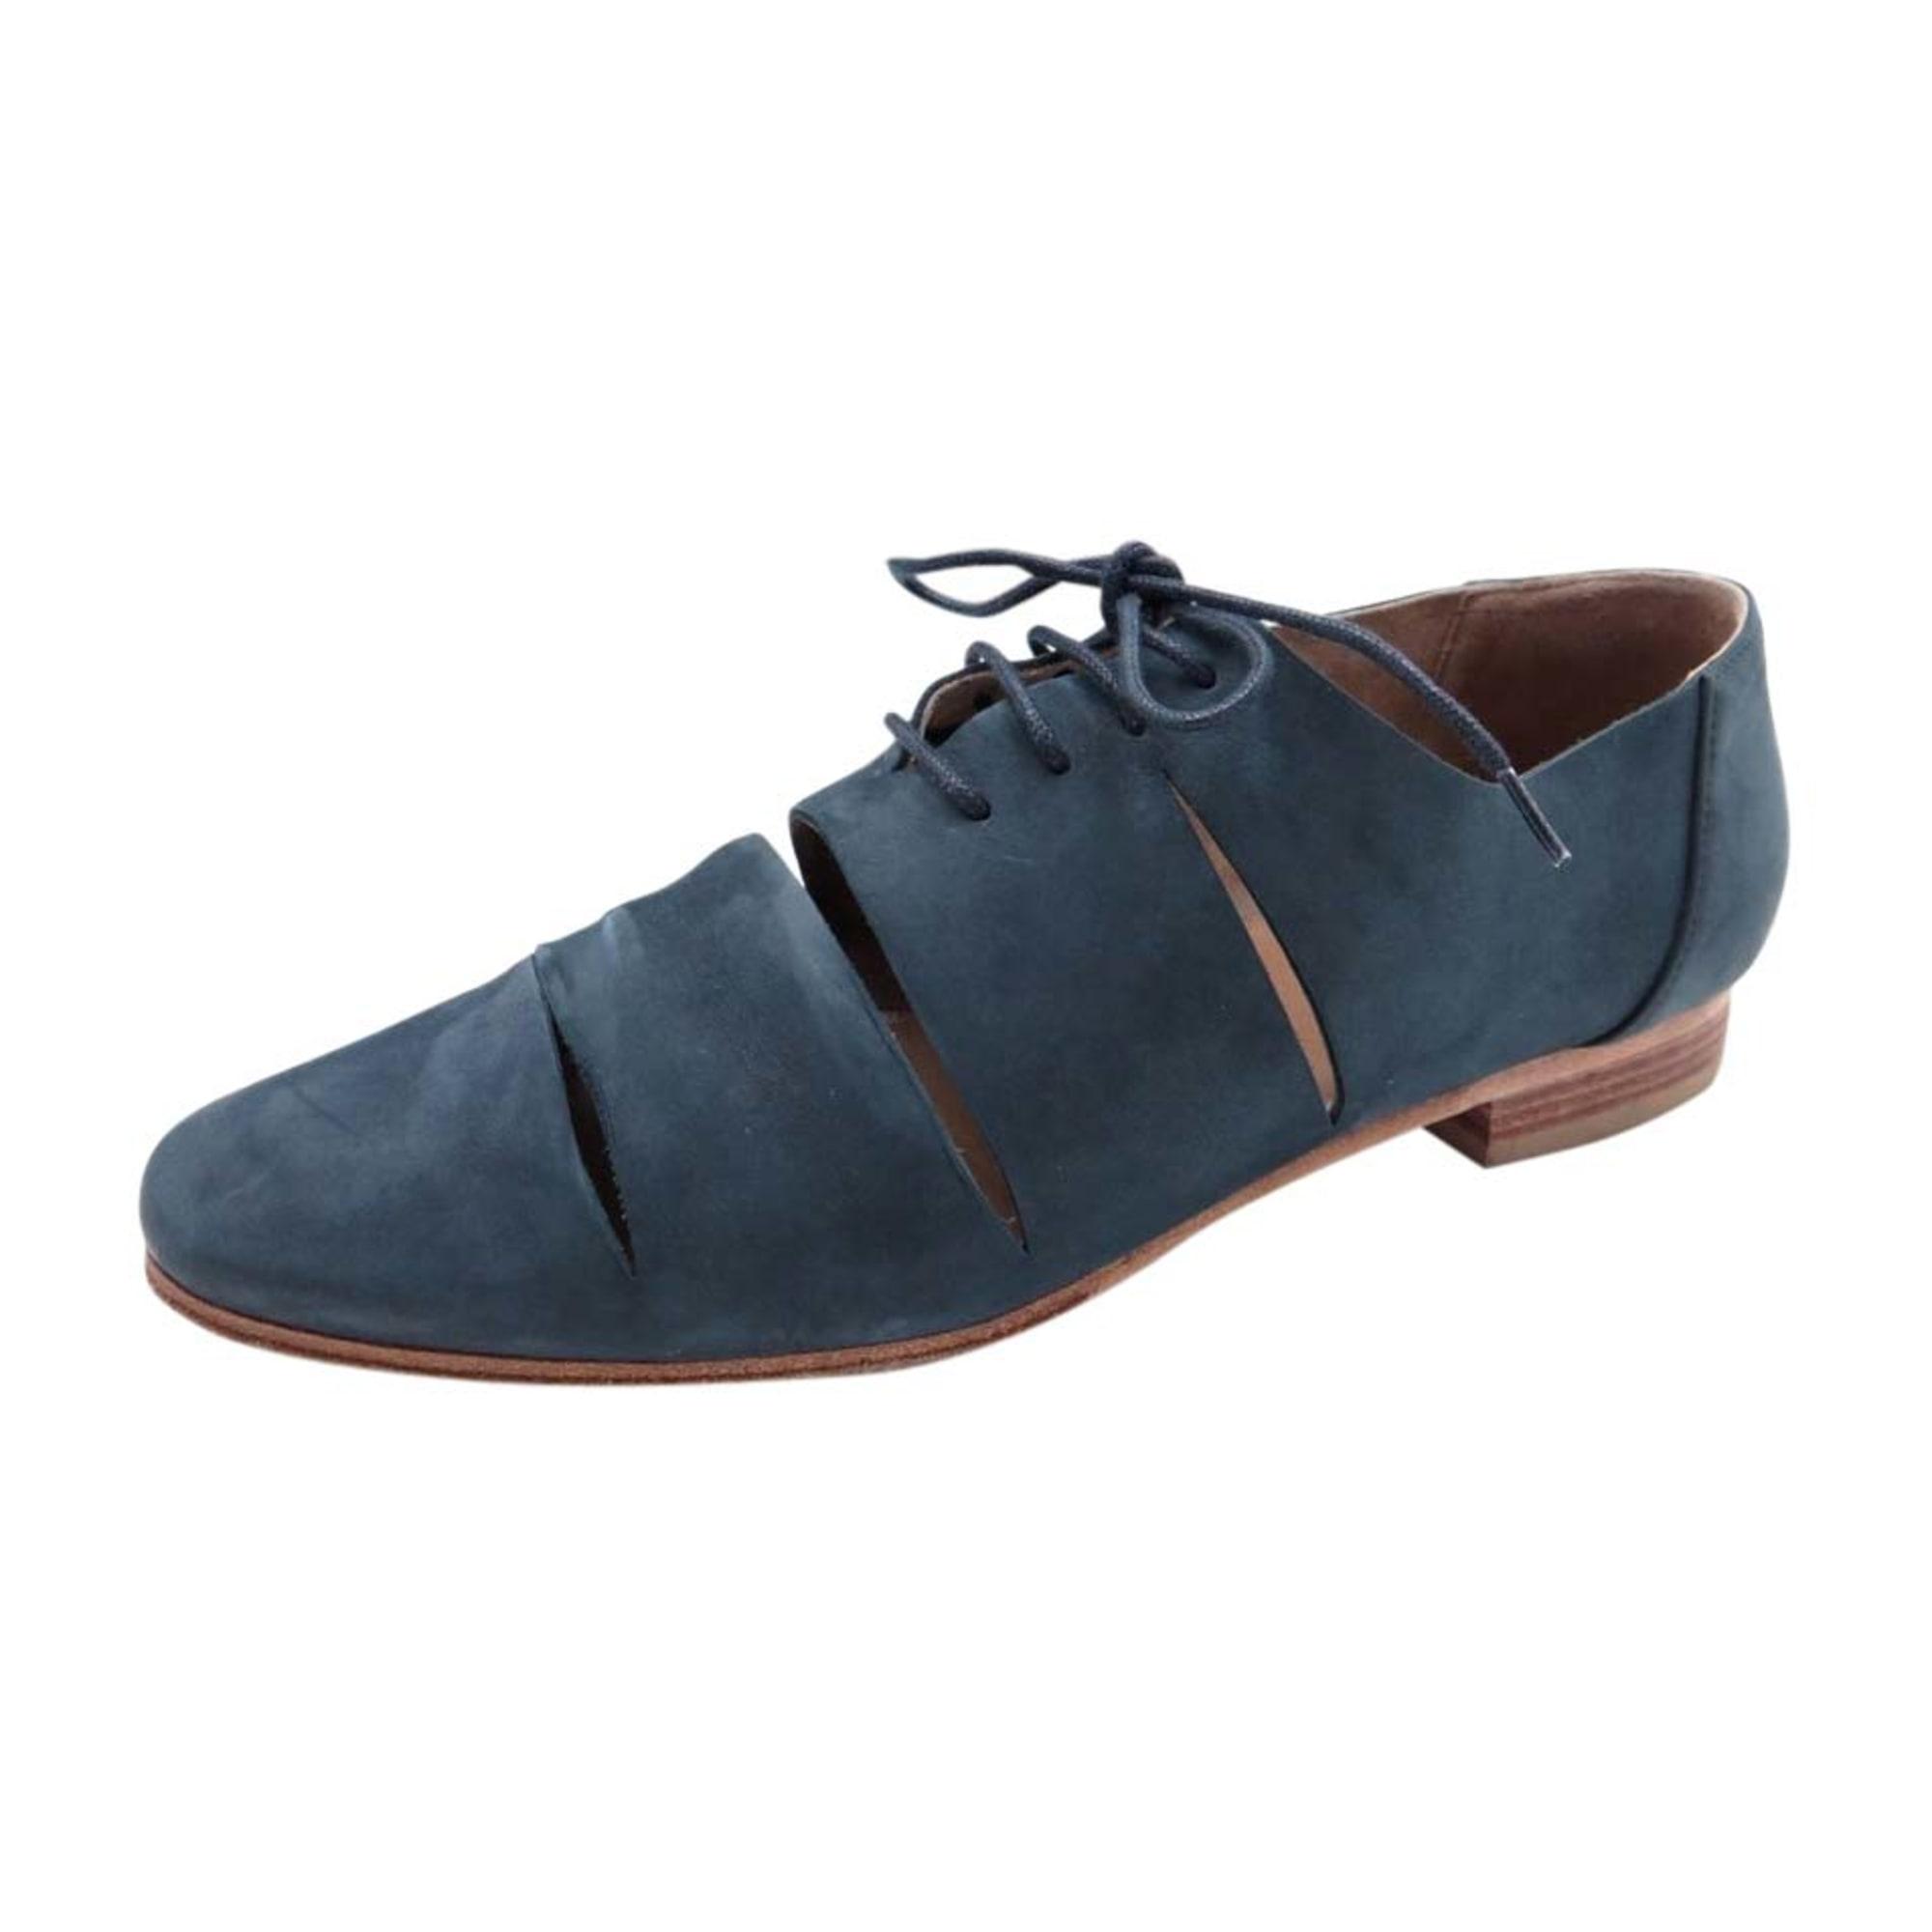 Chaussures à lacets HERMÈS Bleu, bleu marine, bleu turquoise 08f1adfe3c3